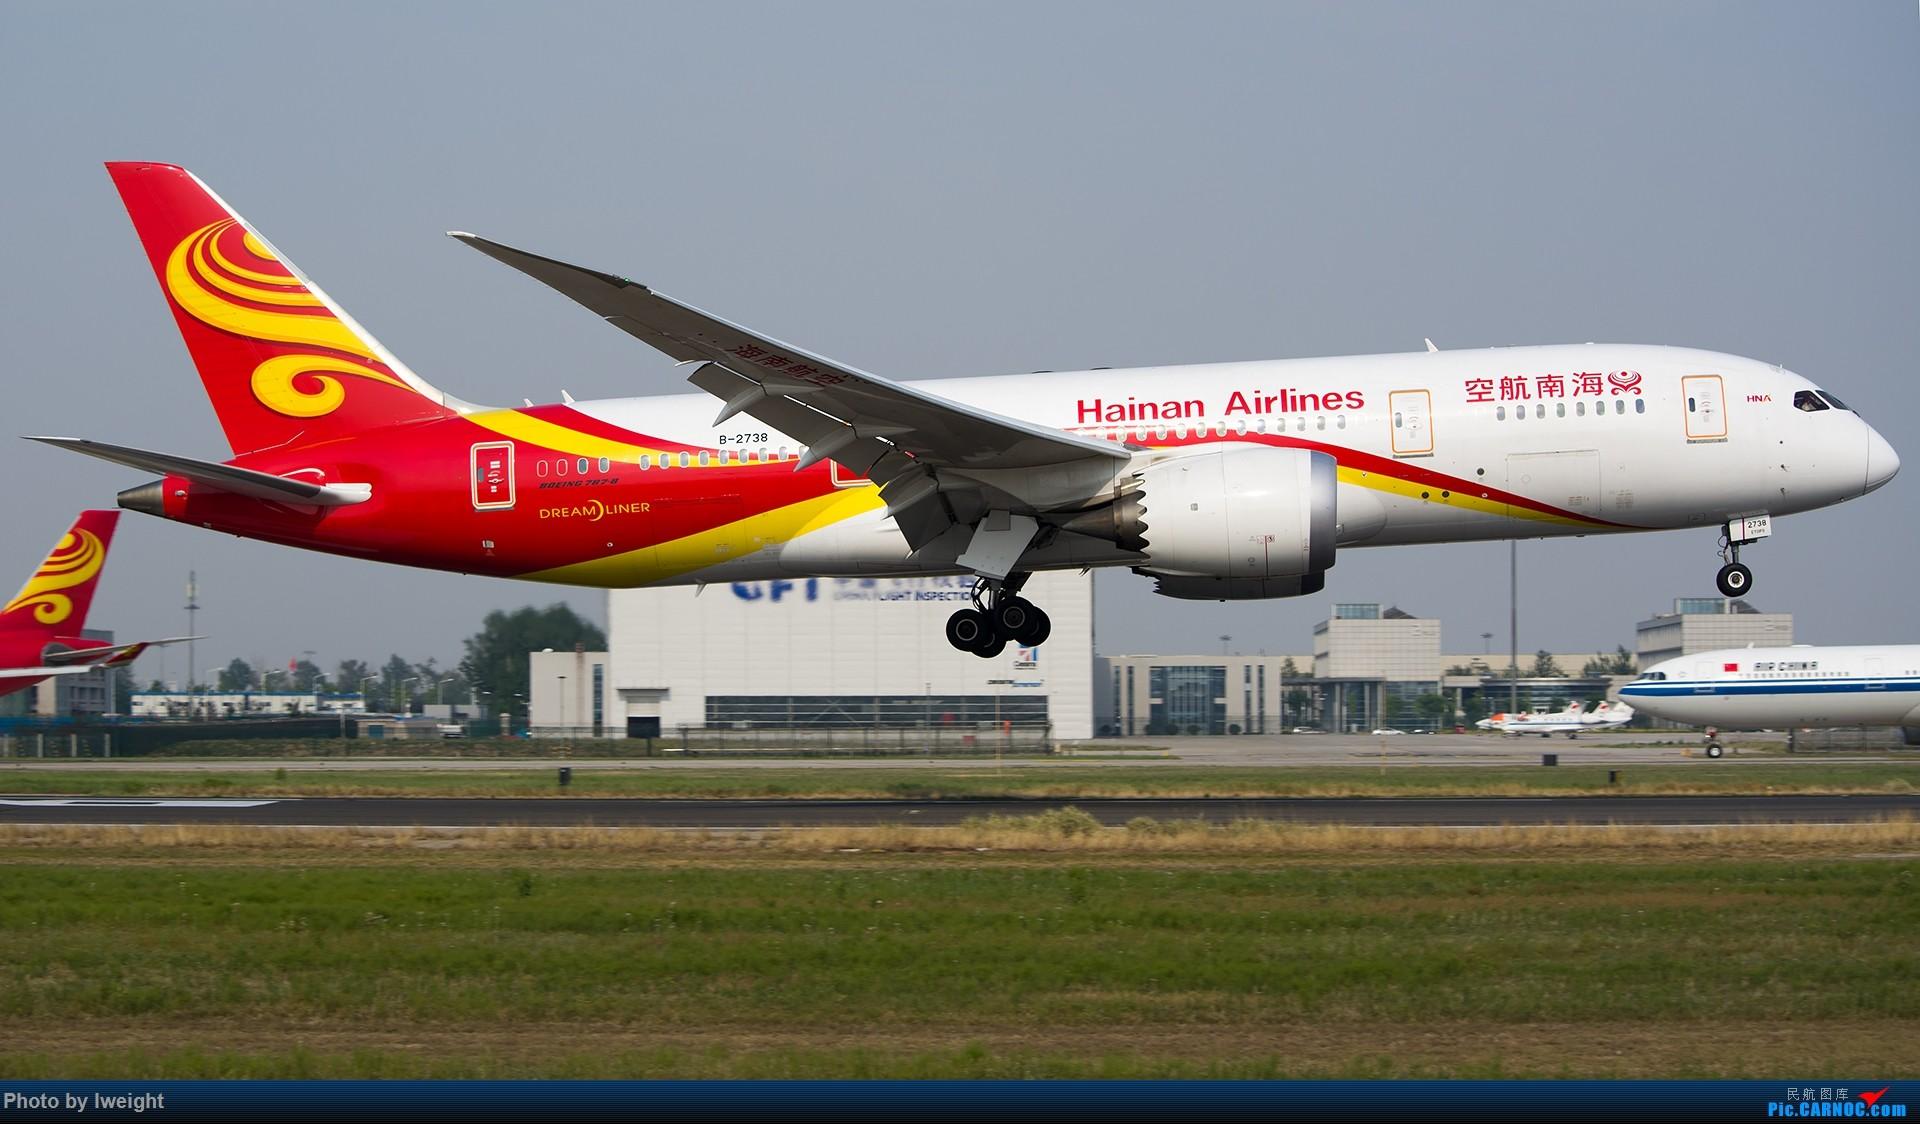 Re:[原创]周末帝都霾天拍机,凑合看看吧【2015-5-23】 BOEING 787-8 B-2738 中国北京首都国际机场